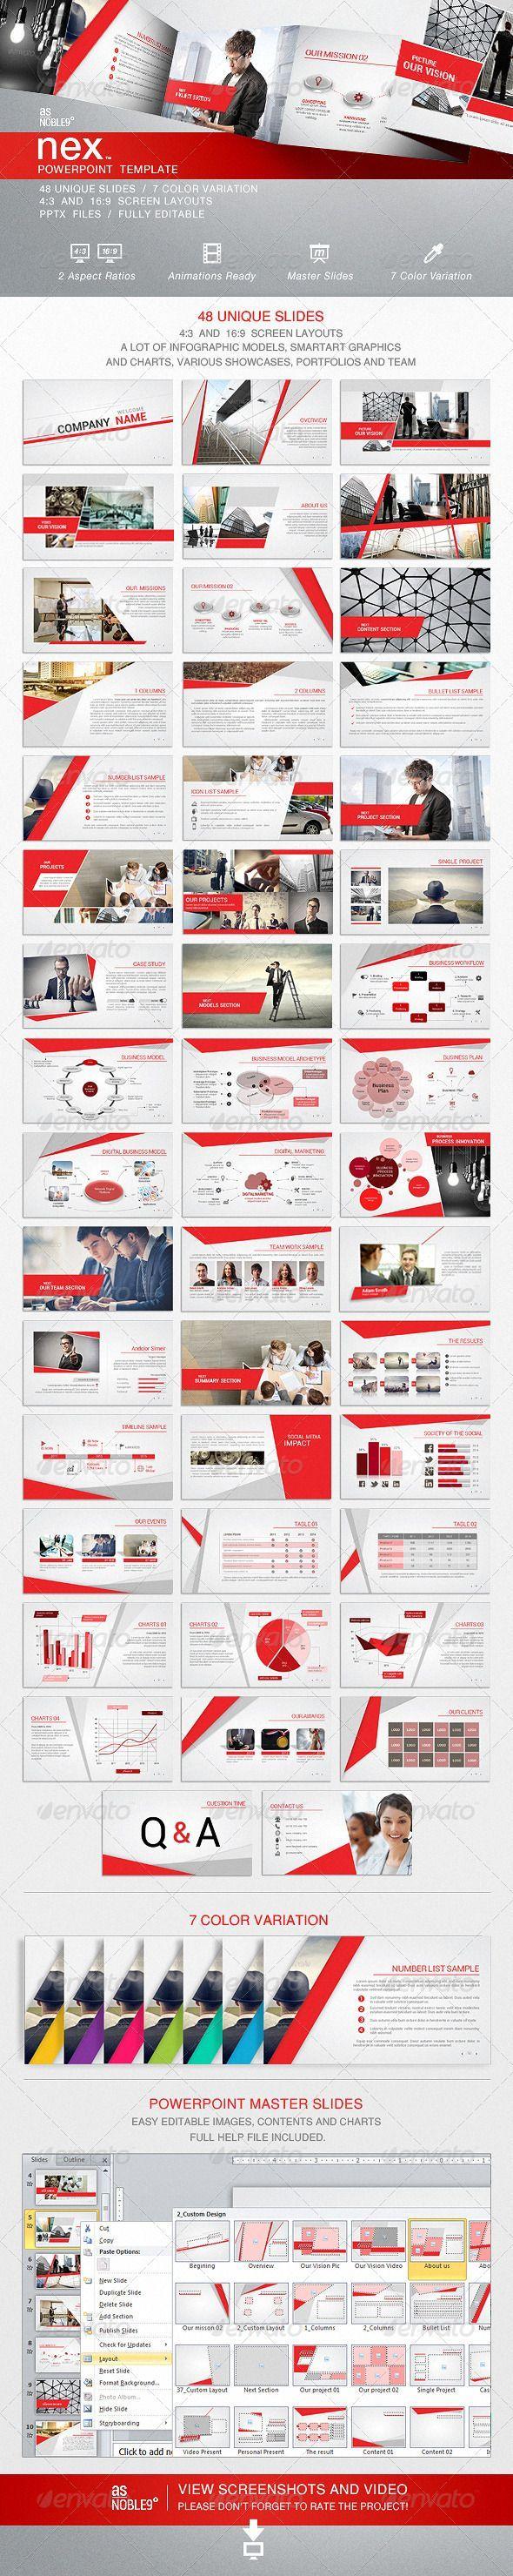 NEX - PowerPoint Template - Business Powerpoint Templates: